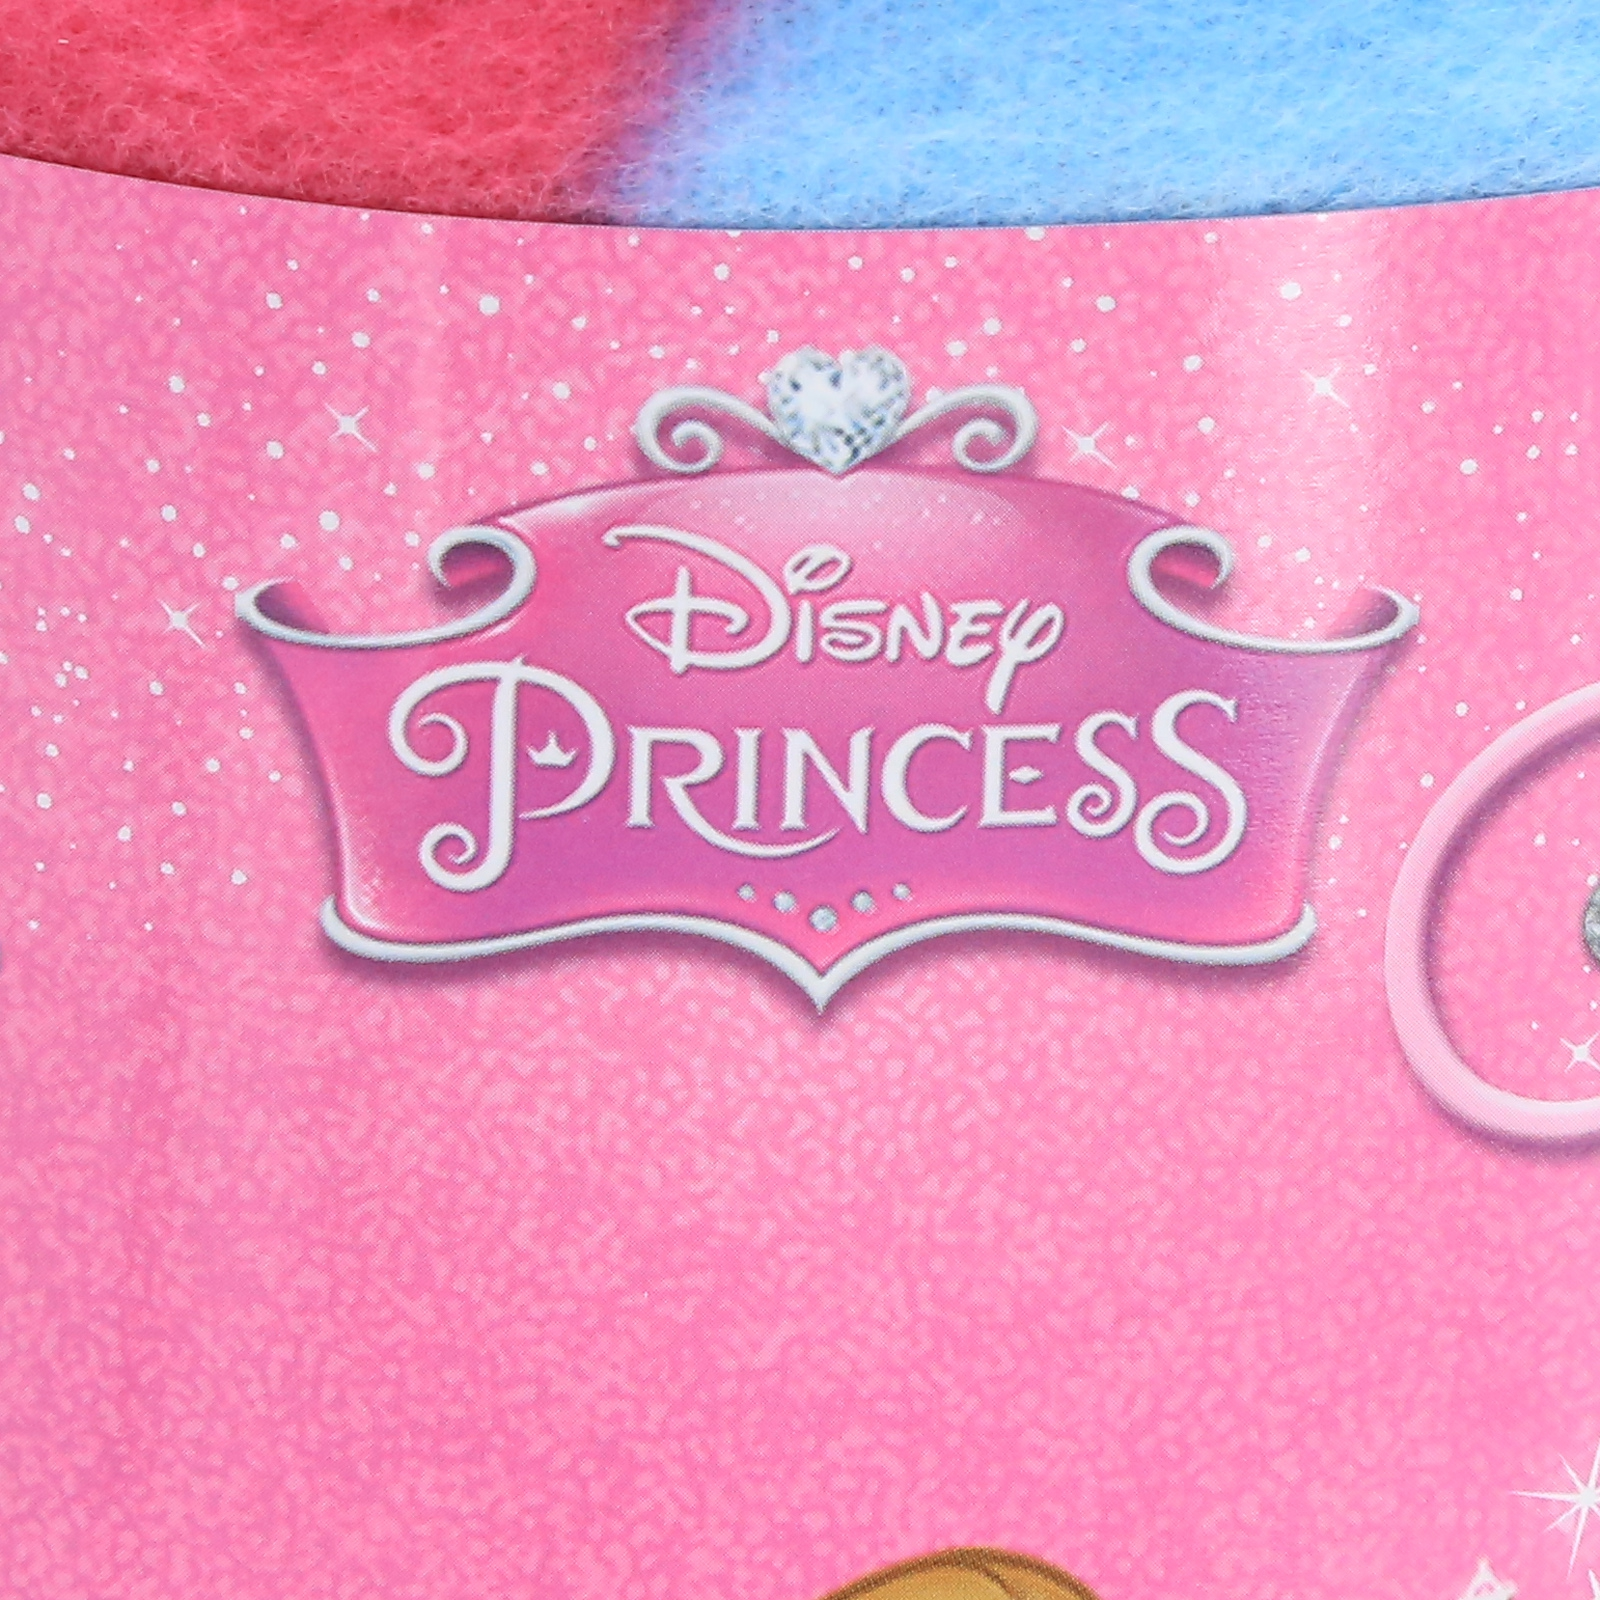 Beauty and the Beast Fleece Throw Blanket 45 x 60 Inch Girls Bedroom Home Decor